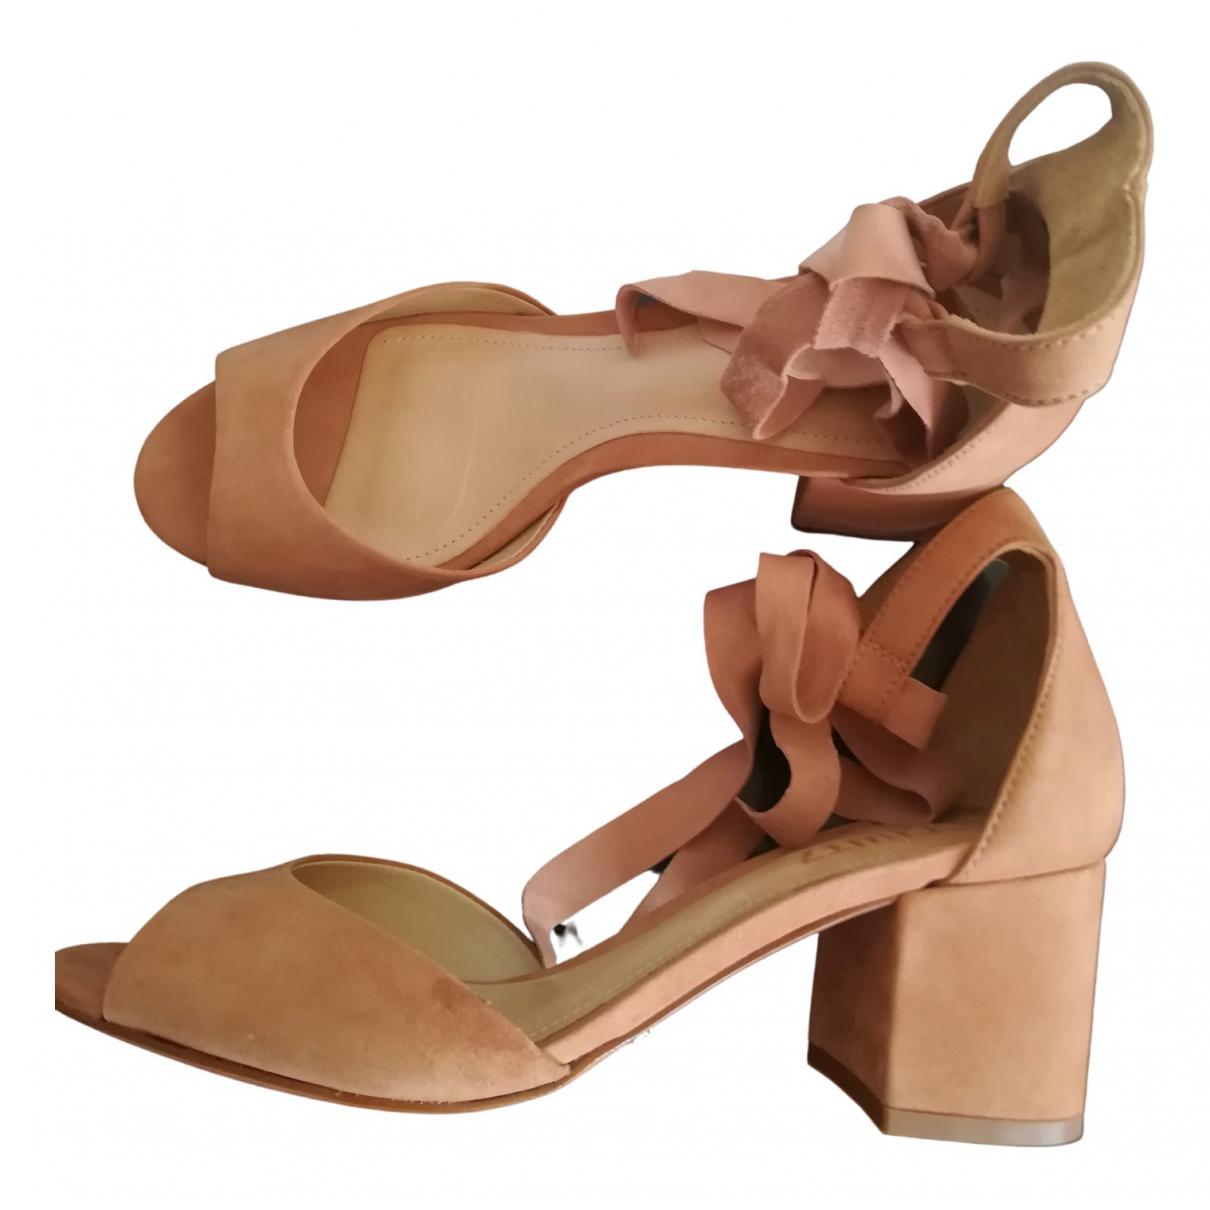 Schutz \N Beige Suede Sandals for Women 39 EU